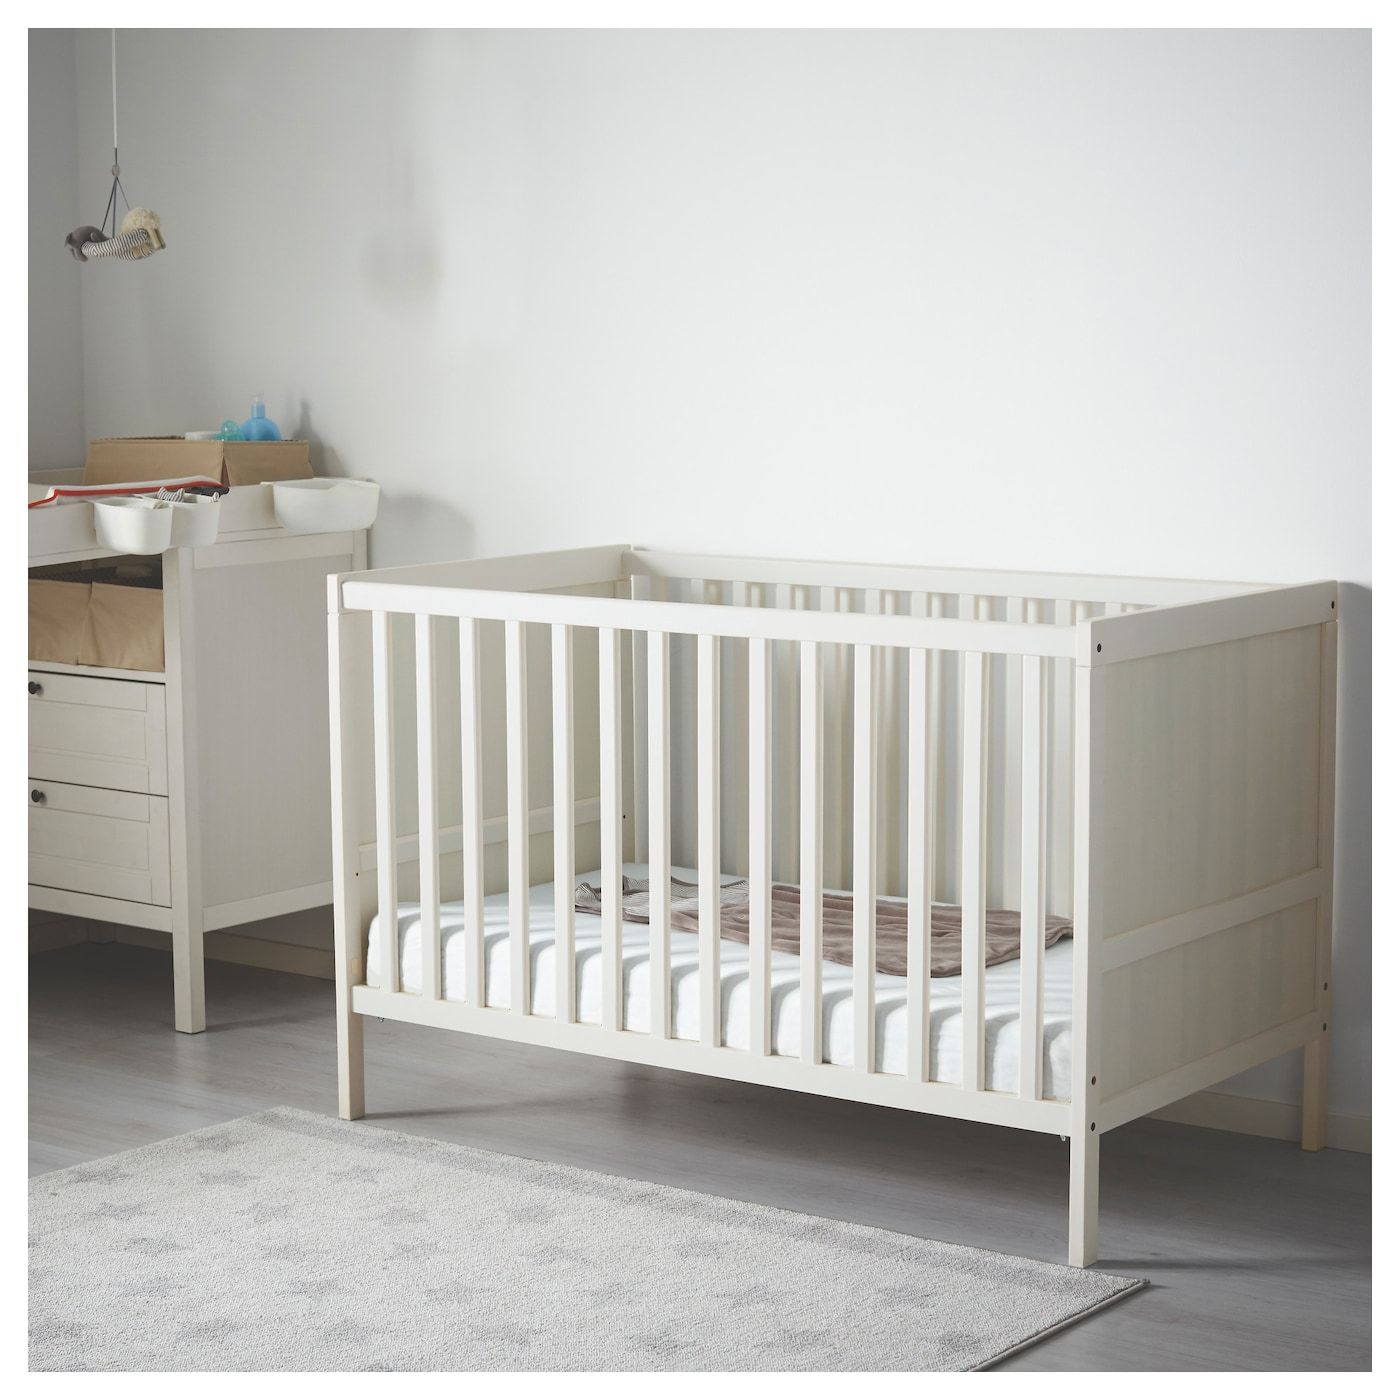 Sundvik Crib White Ikea Crib Cribs Ikea Cot